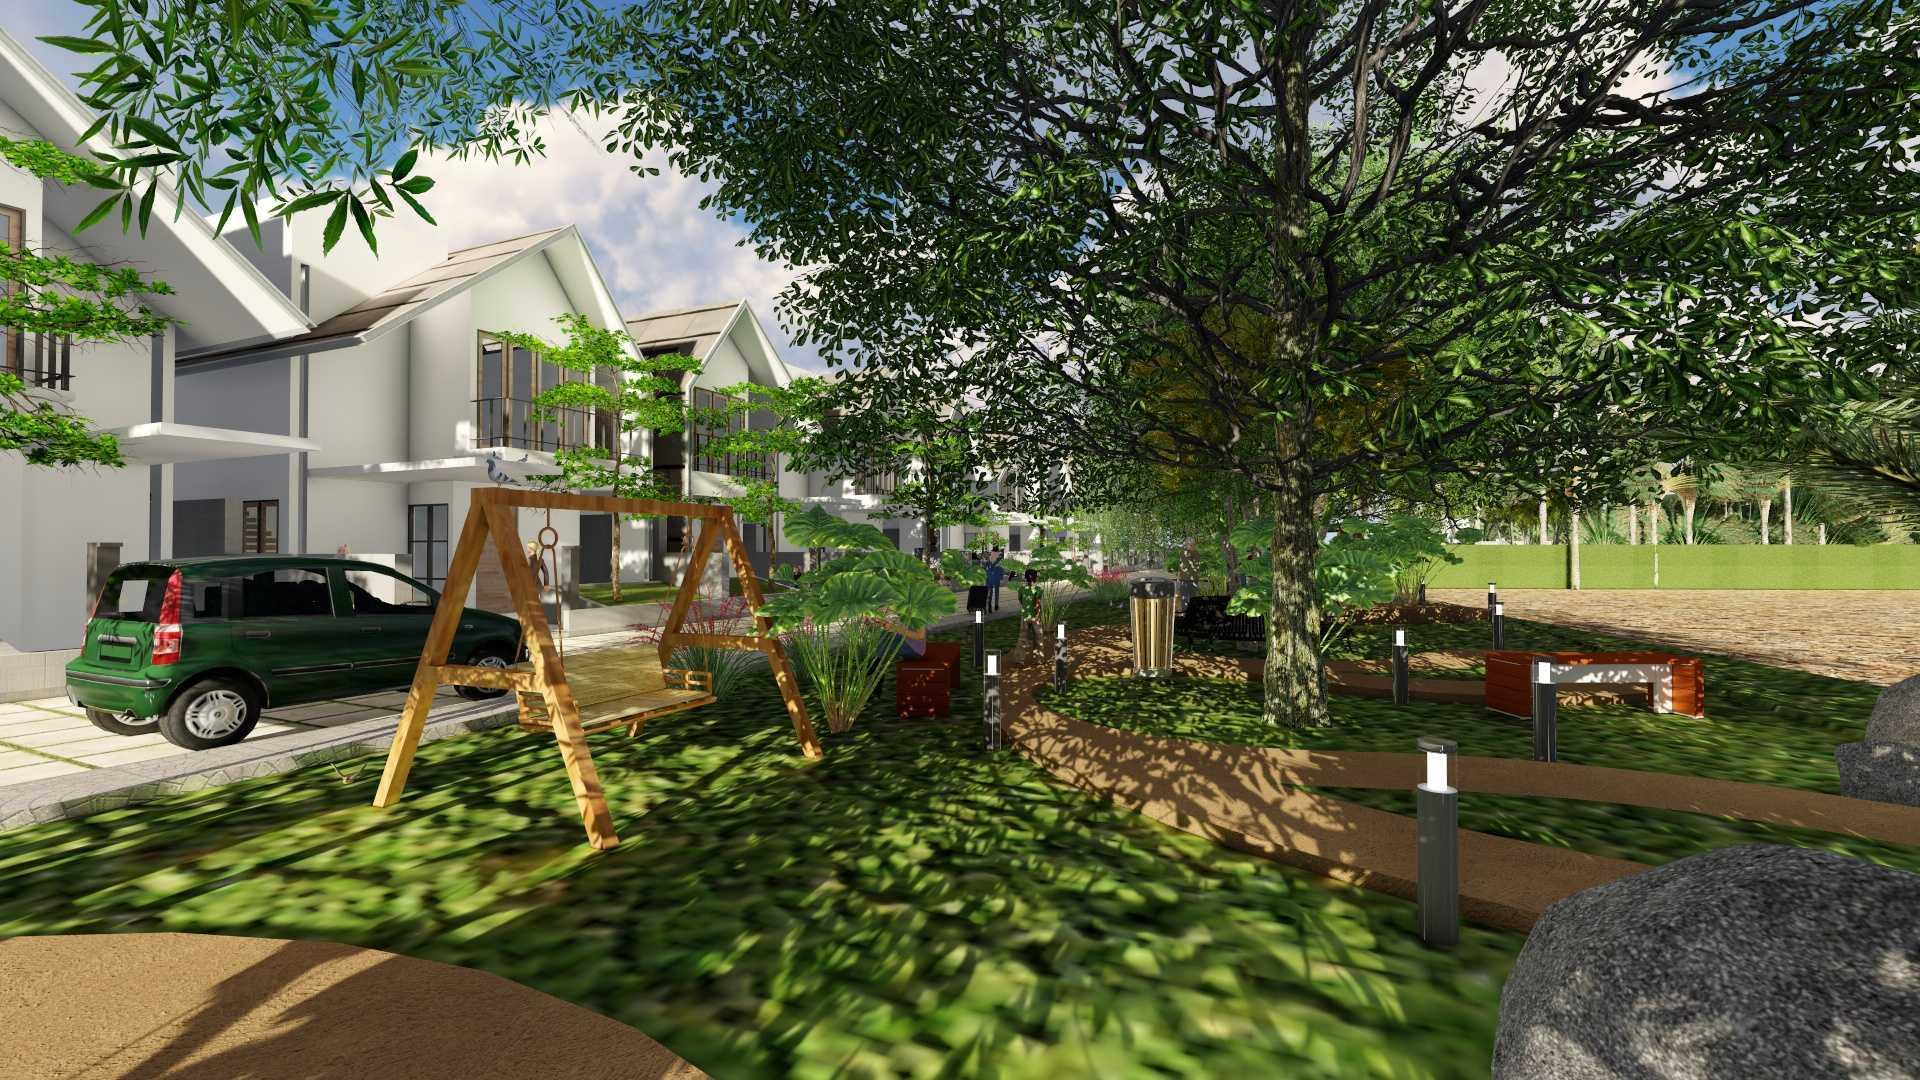 Samitrayasa Design Limo Housing Limo, Kota Depok, Jawa Barat, Indonesia Limo, Kota Depok, Jawa Barat, Indonesia 863 Tropis  32828